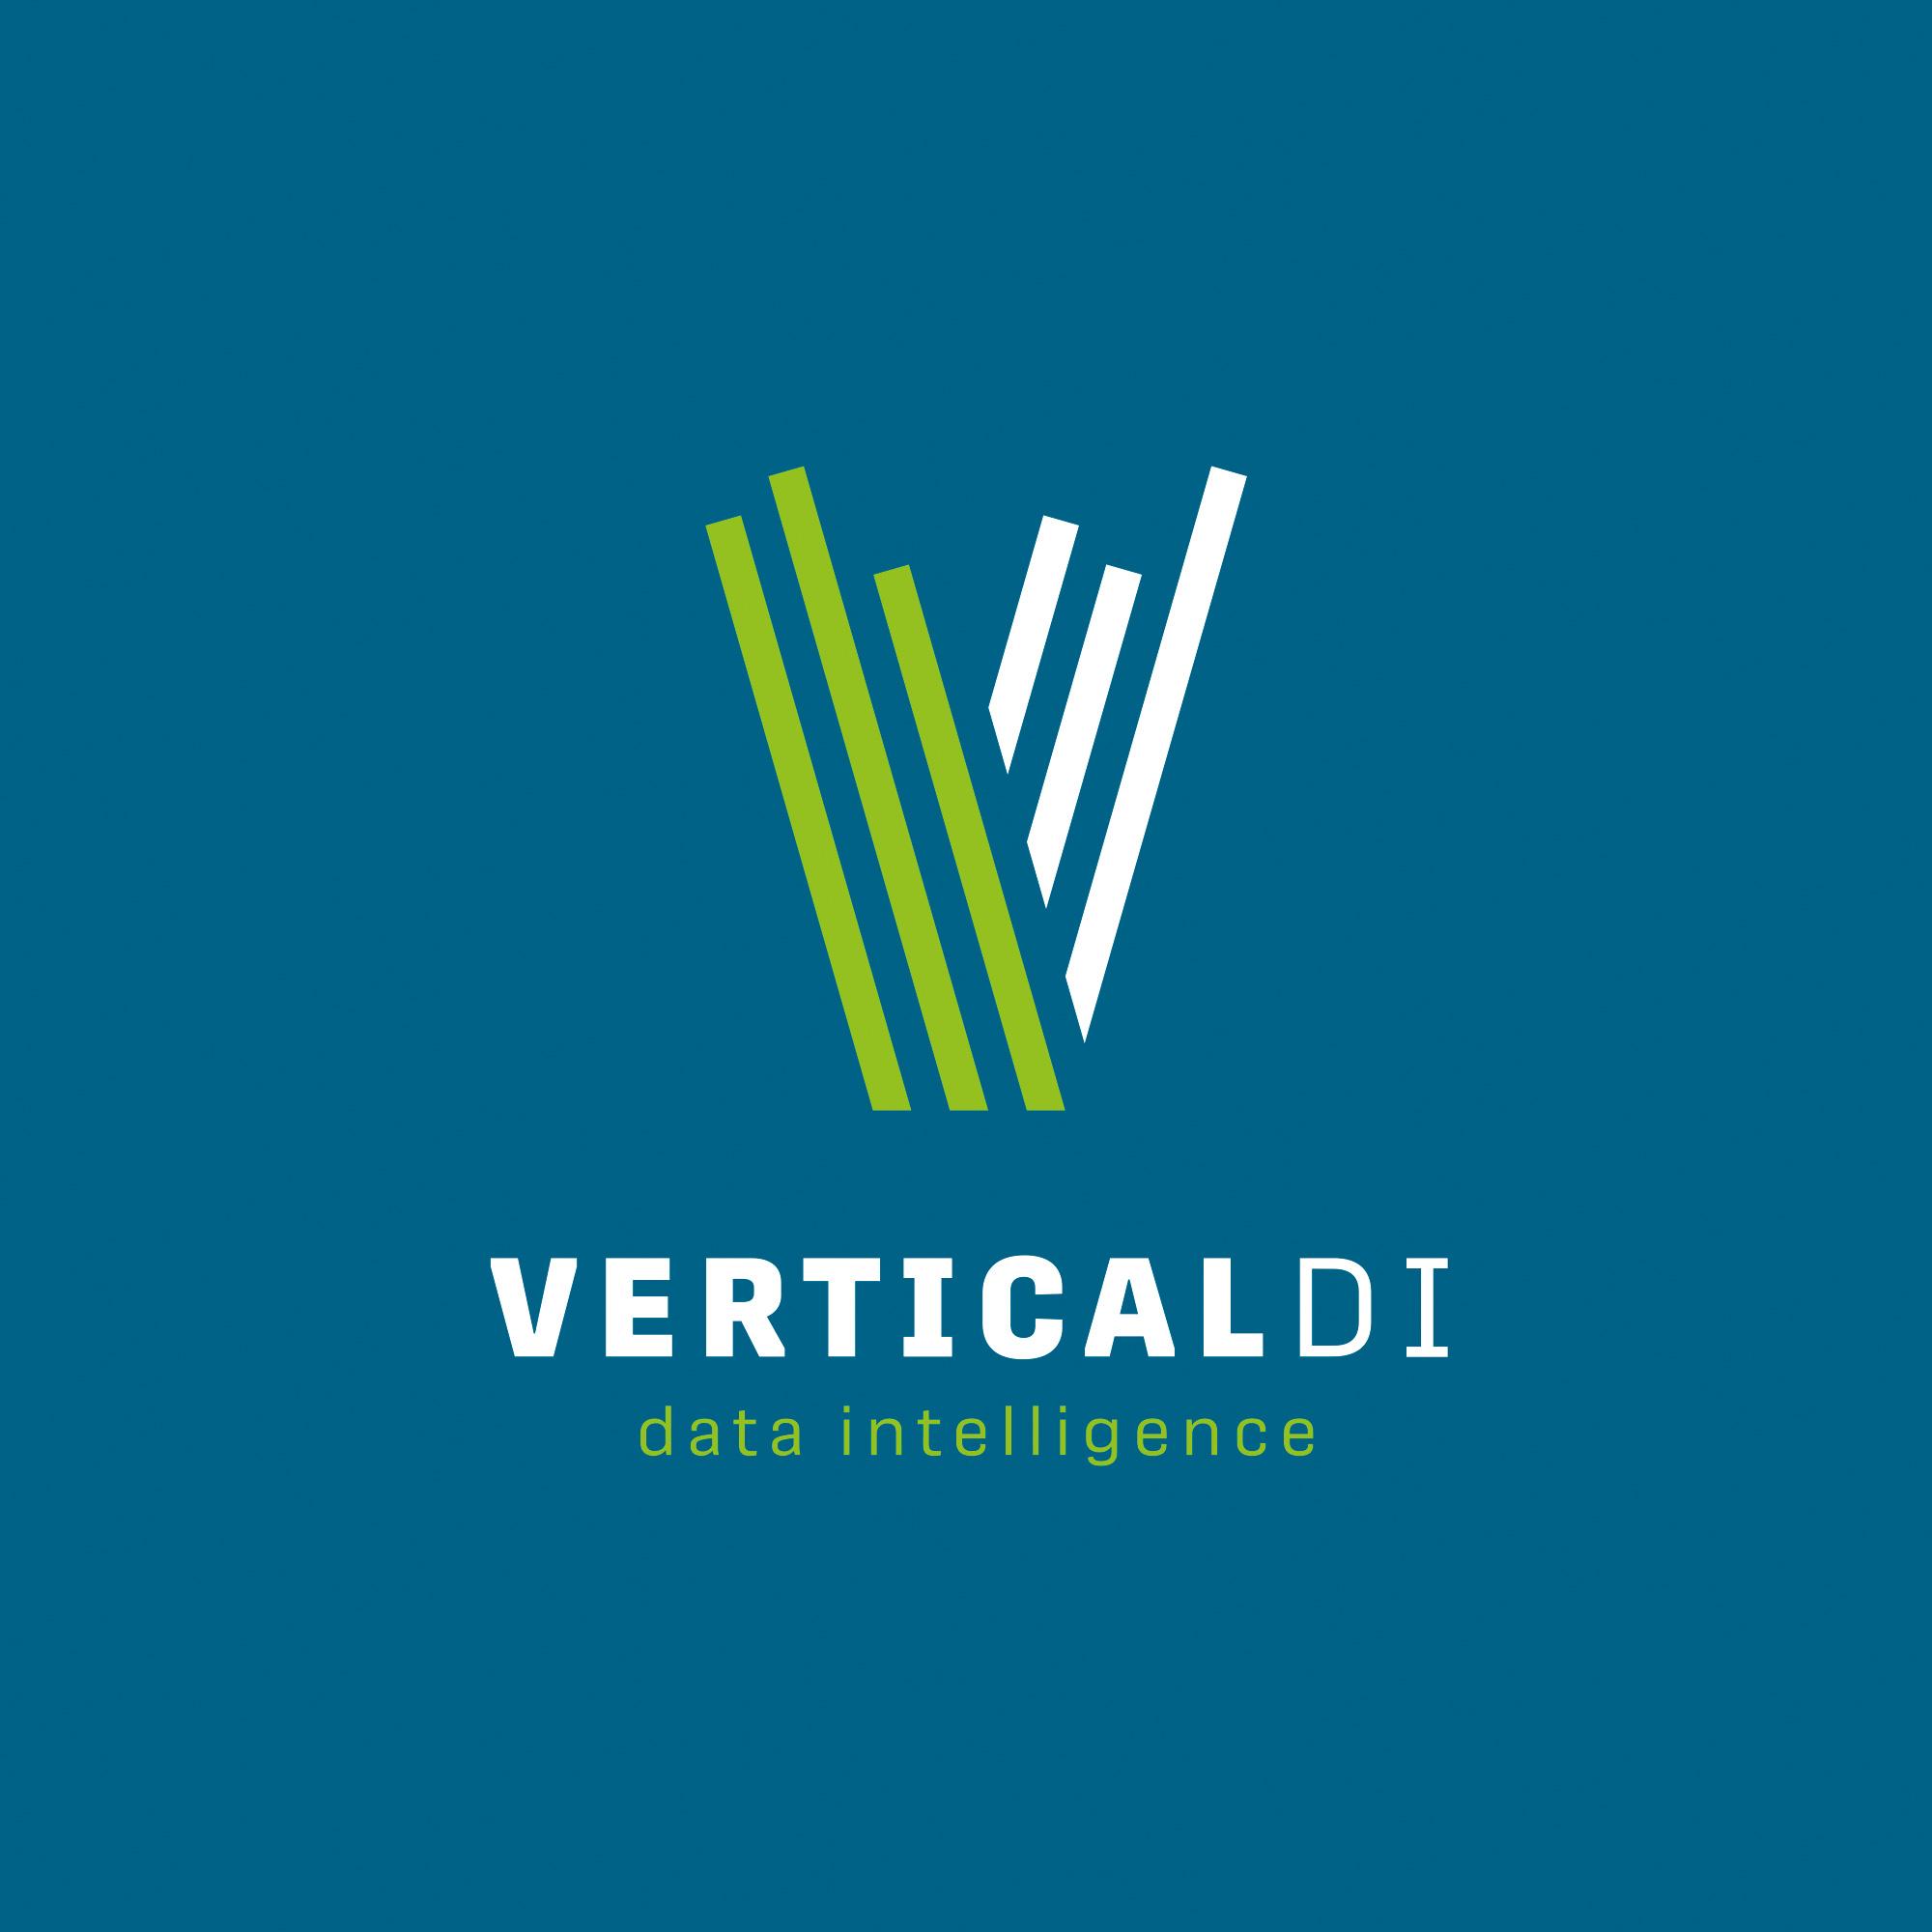 [album/Products_Model_Product/119/Vertical_DI_logo_4c_inv_B.jpg]